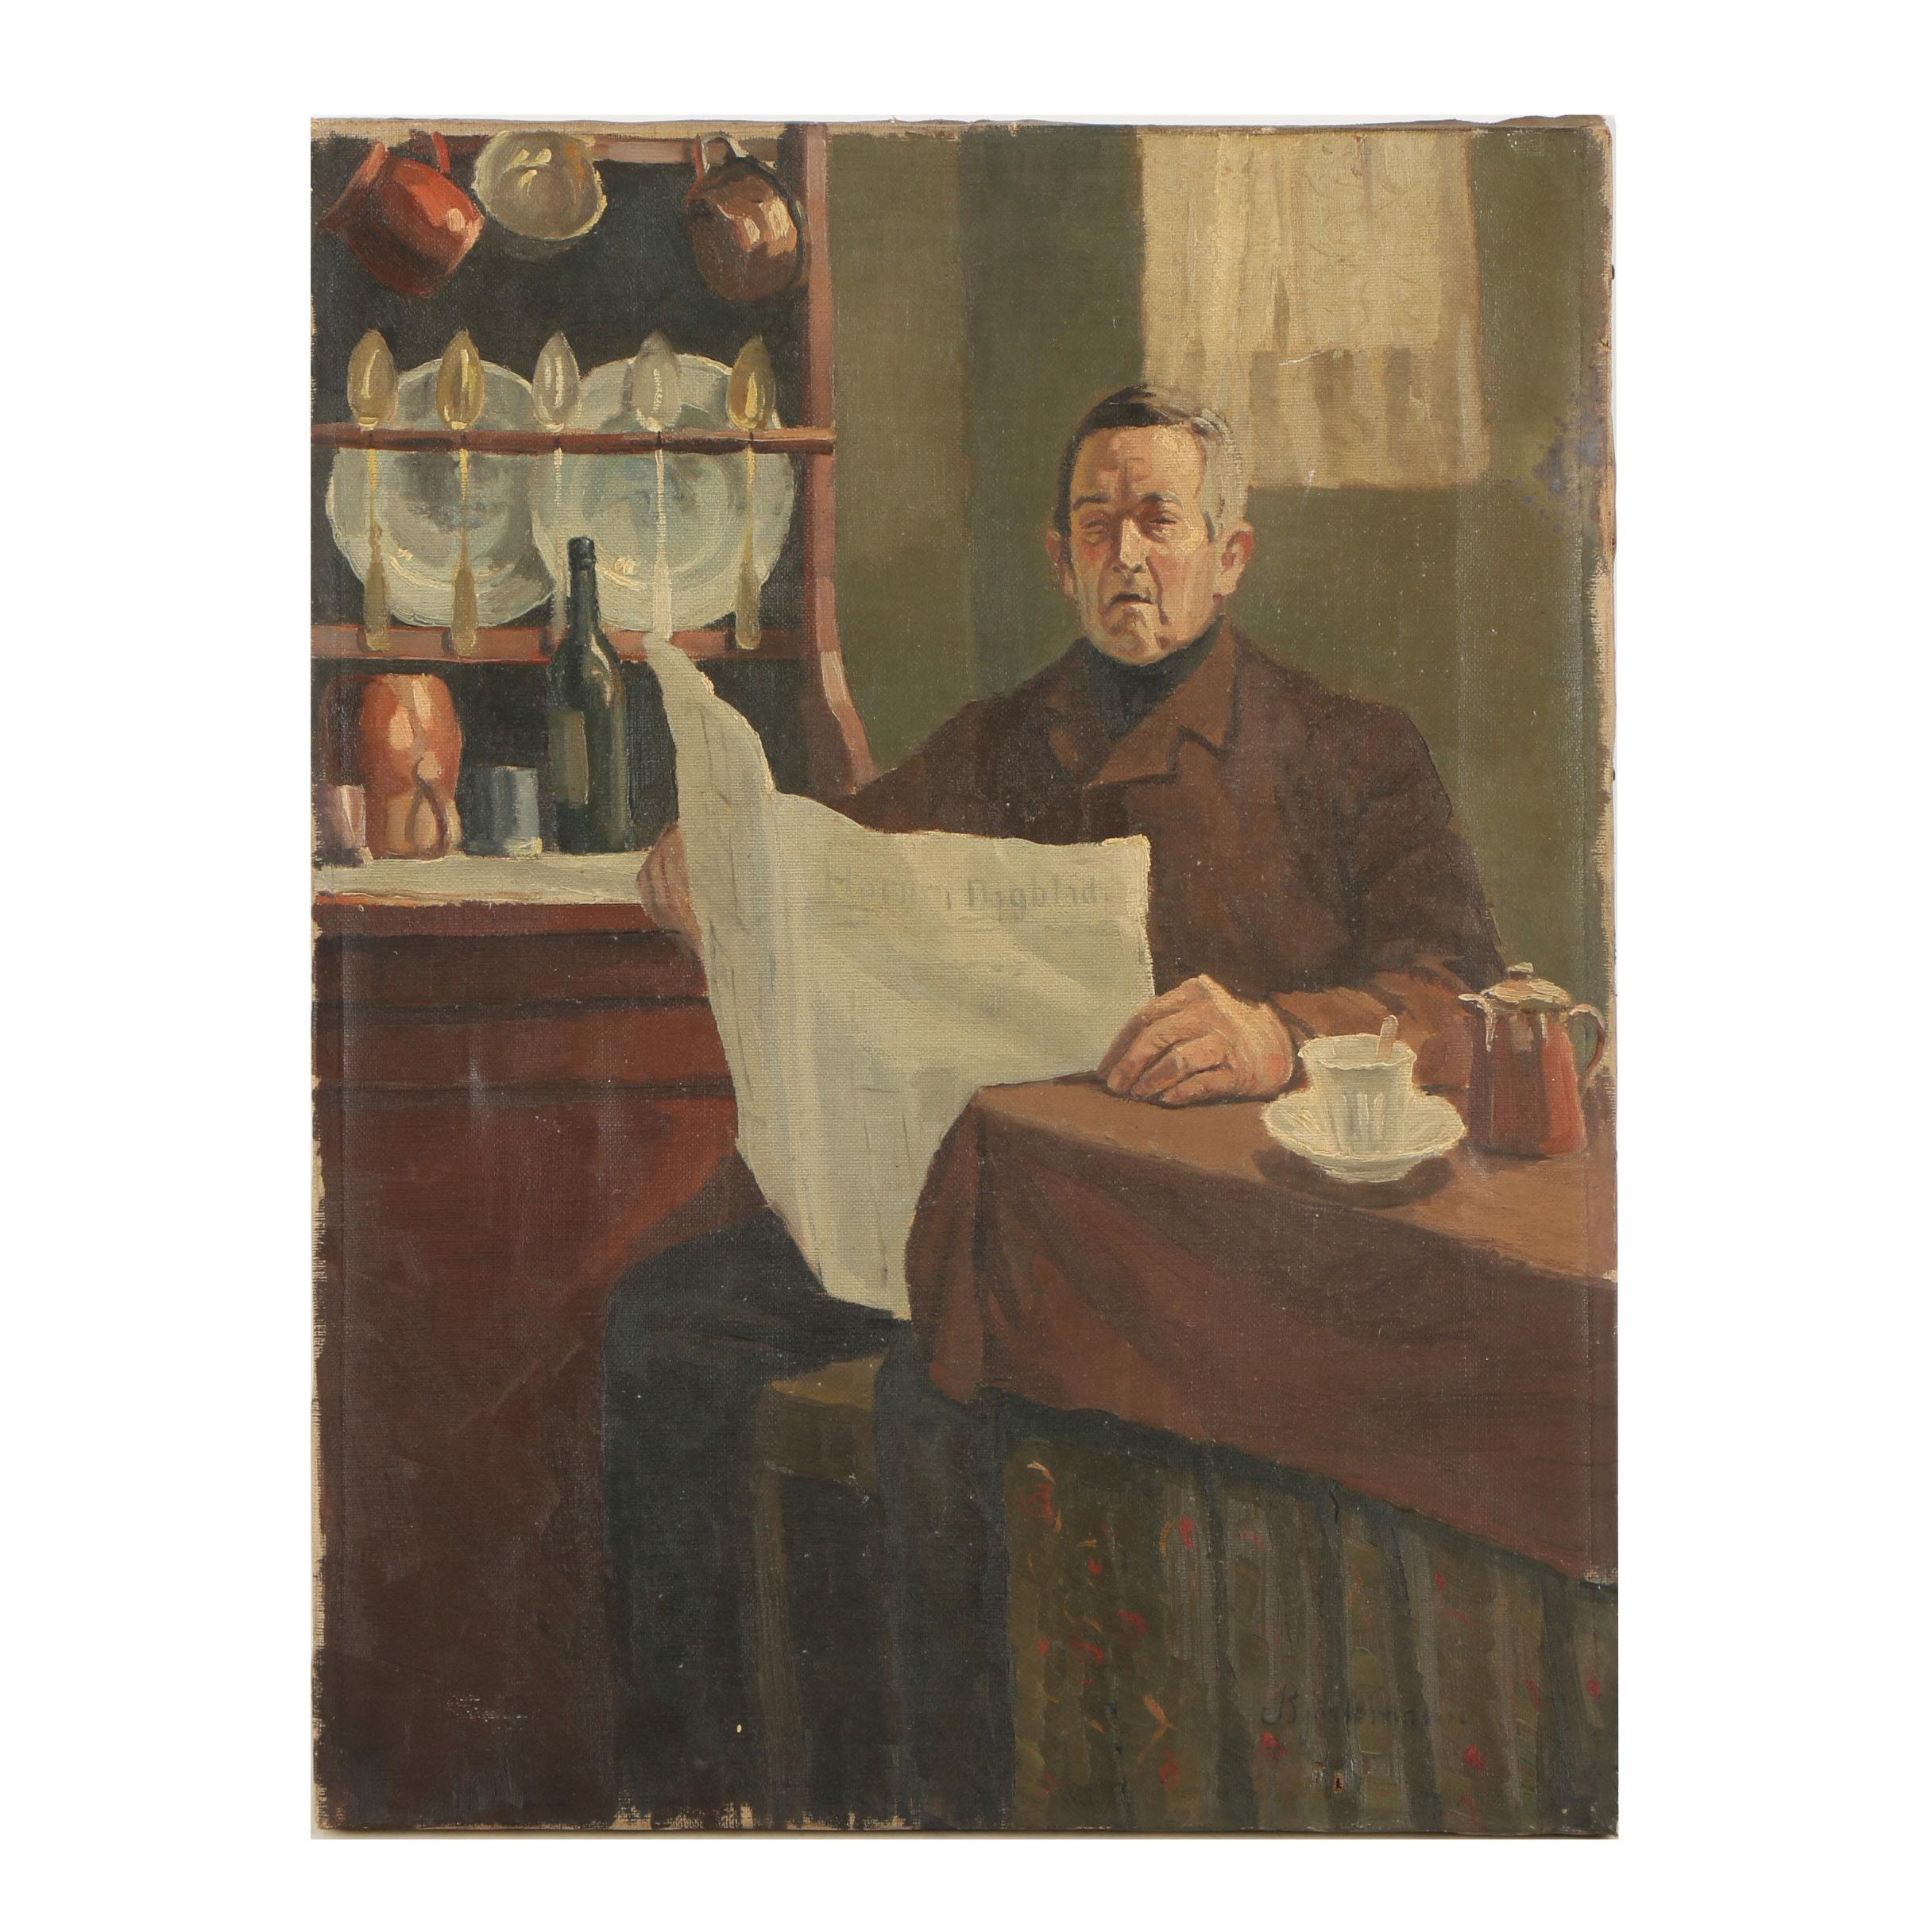 Björkmann Mid Century Oil Portrait of Man Reading Newspaper